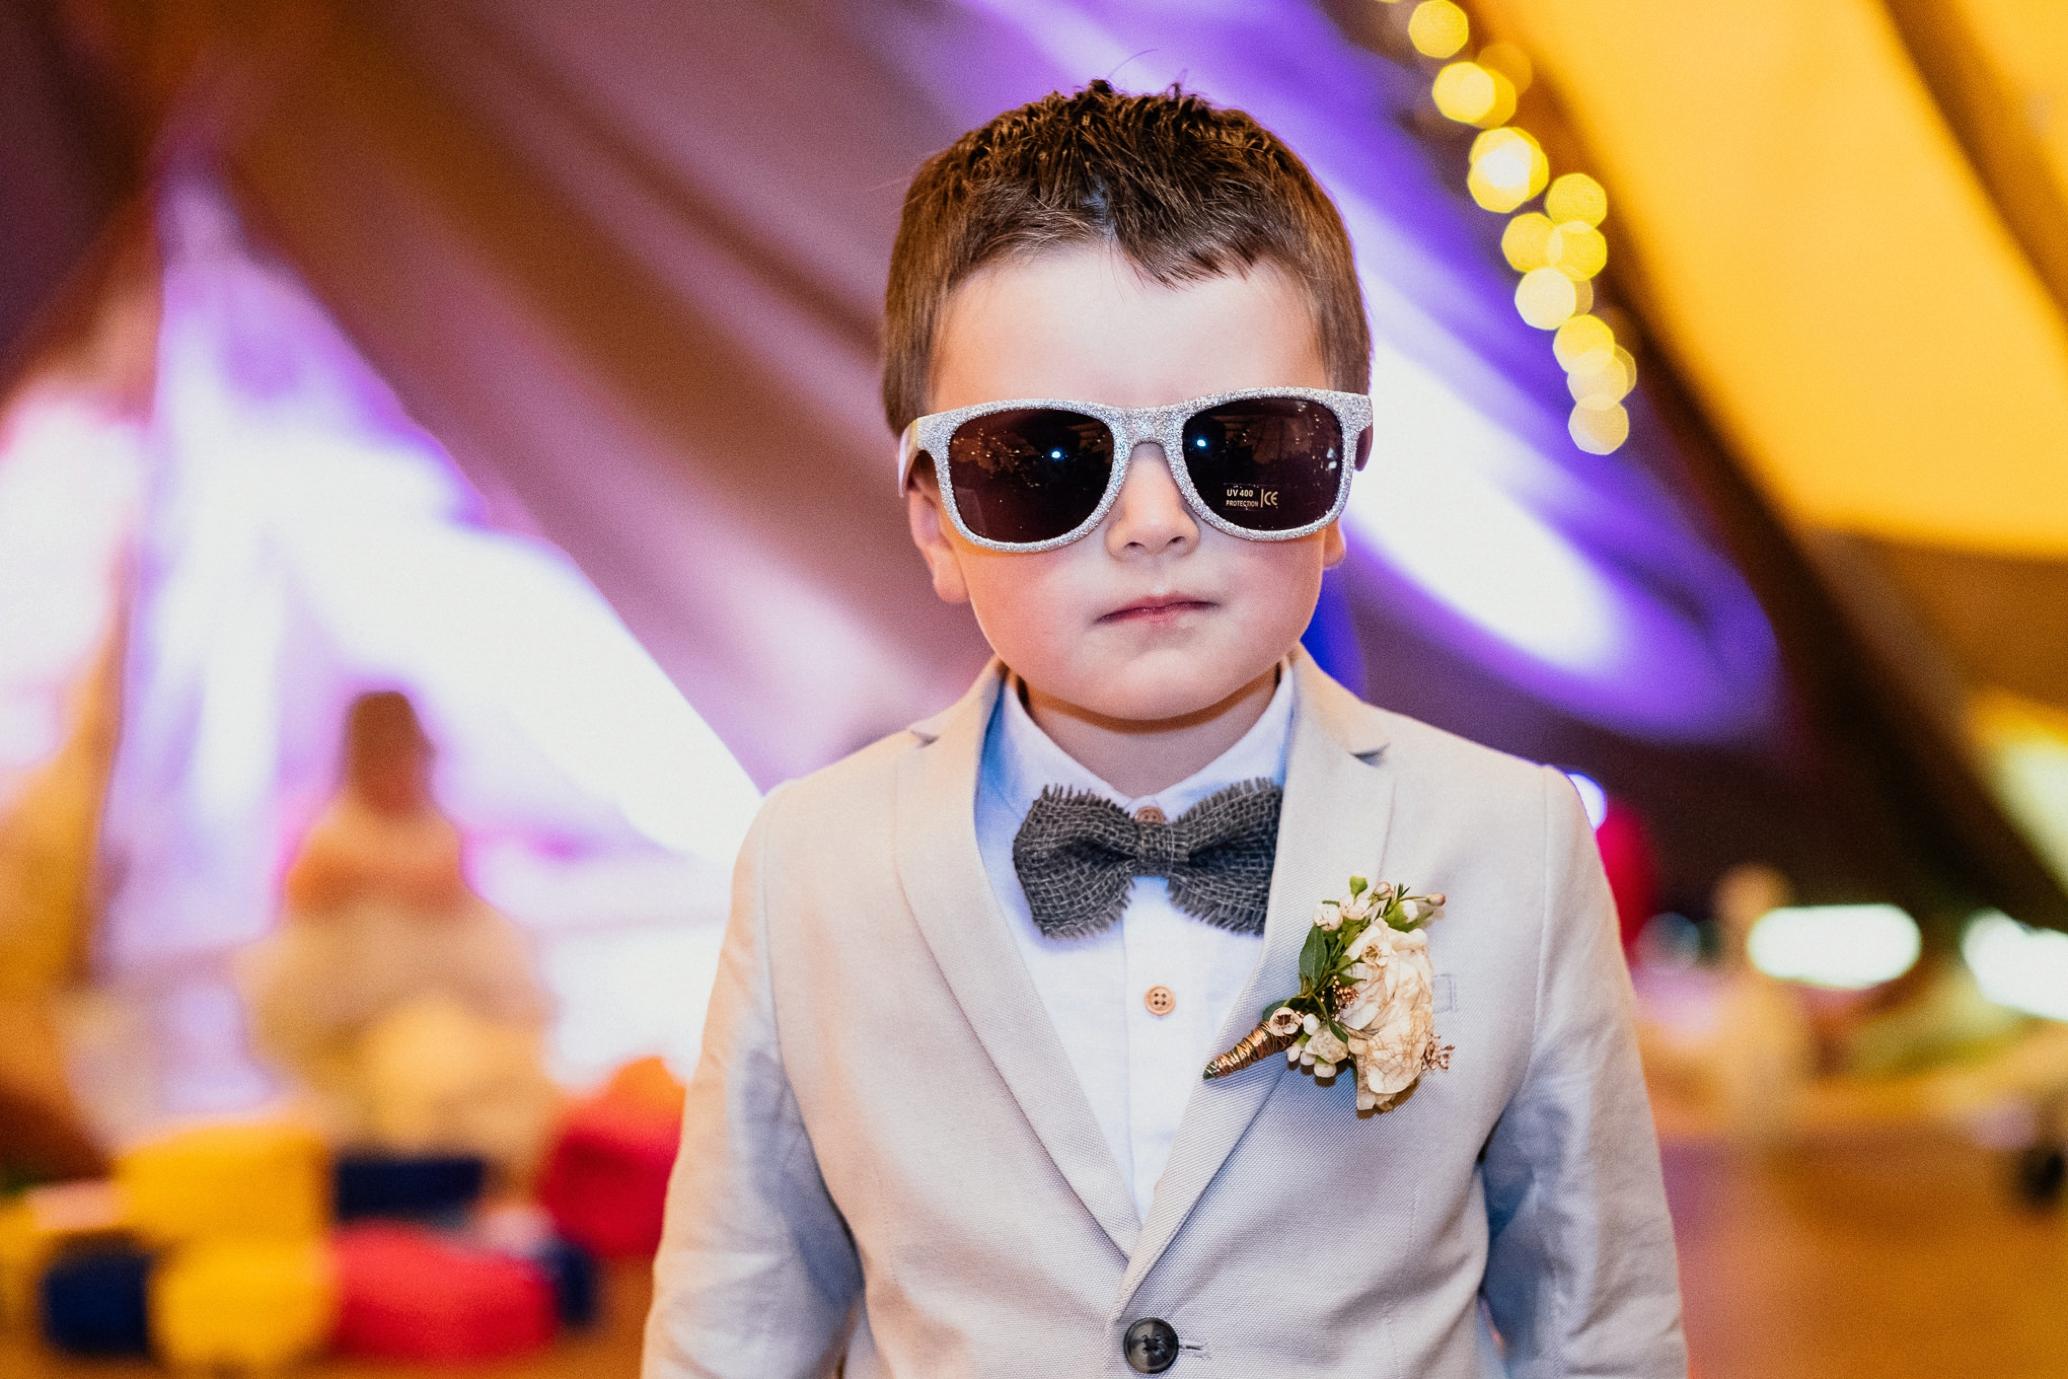 20170520_euan robertson weddings_096_WEB.jpg